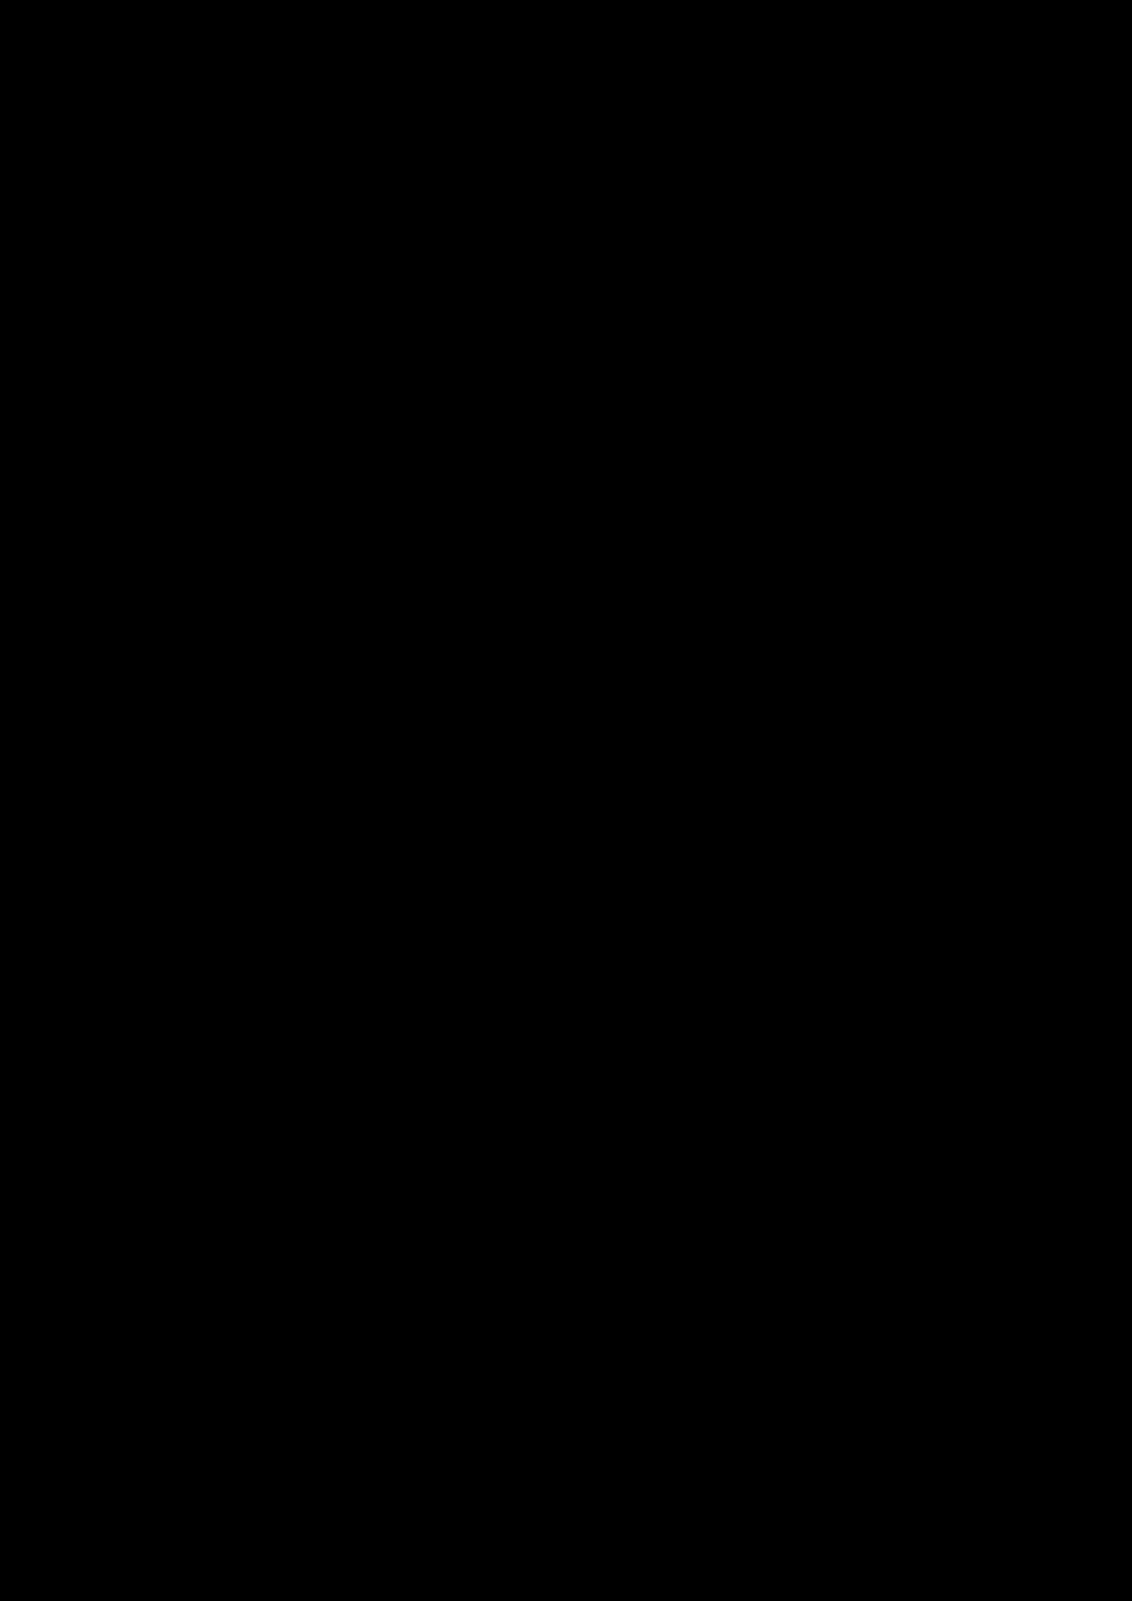 Belyiy sokol slide, Image 48